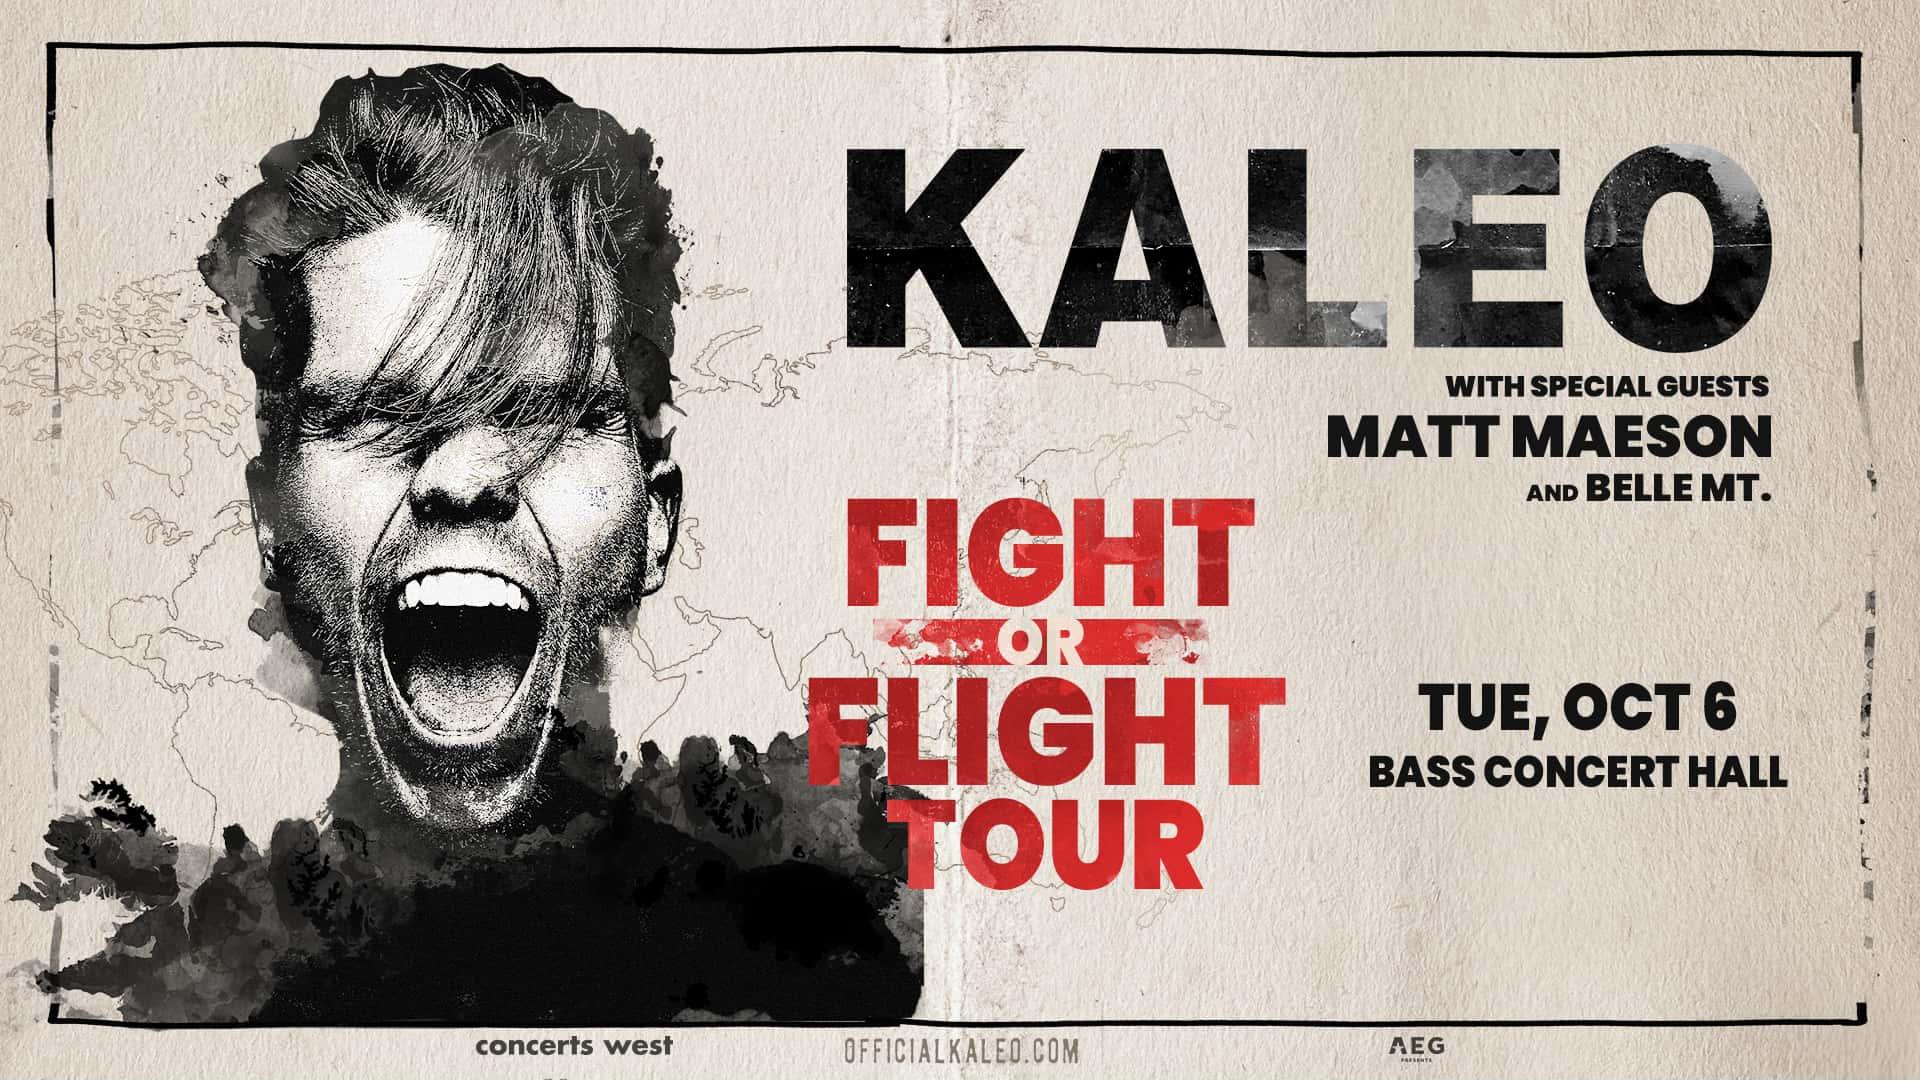 Kaleo with Matt Maeson and Belle Mt.